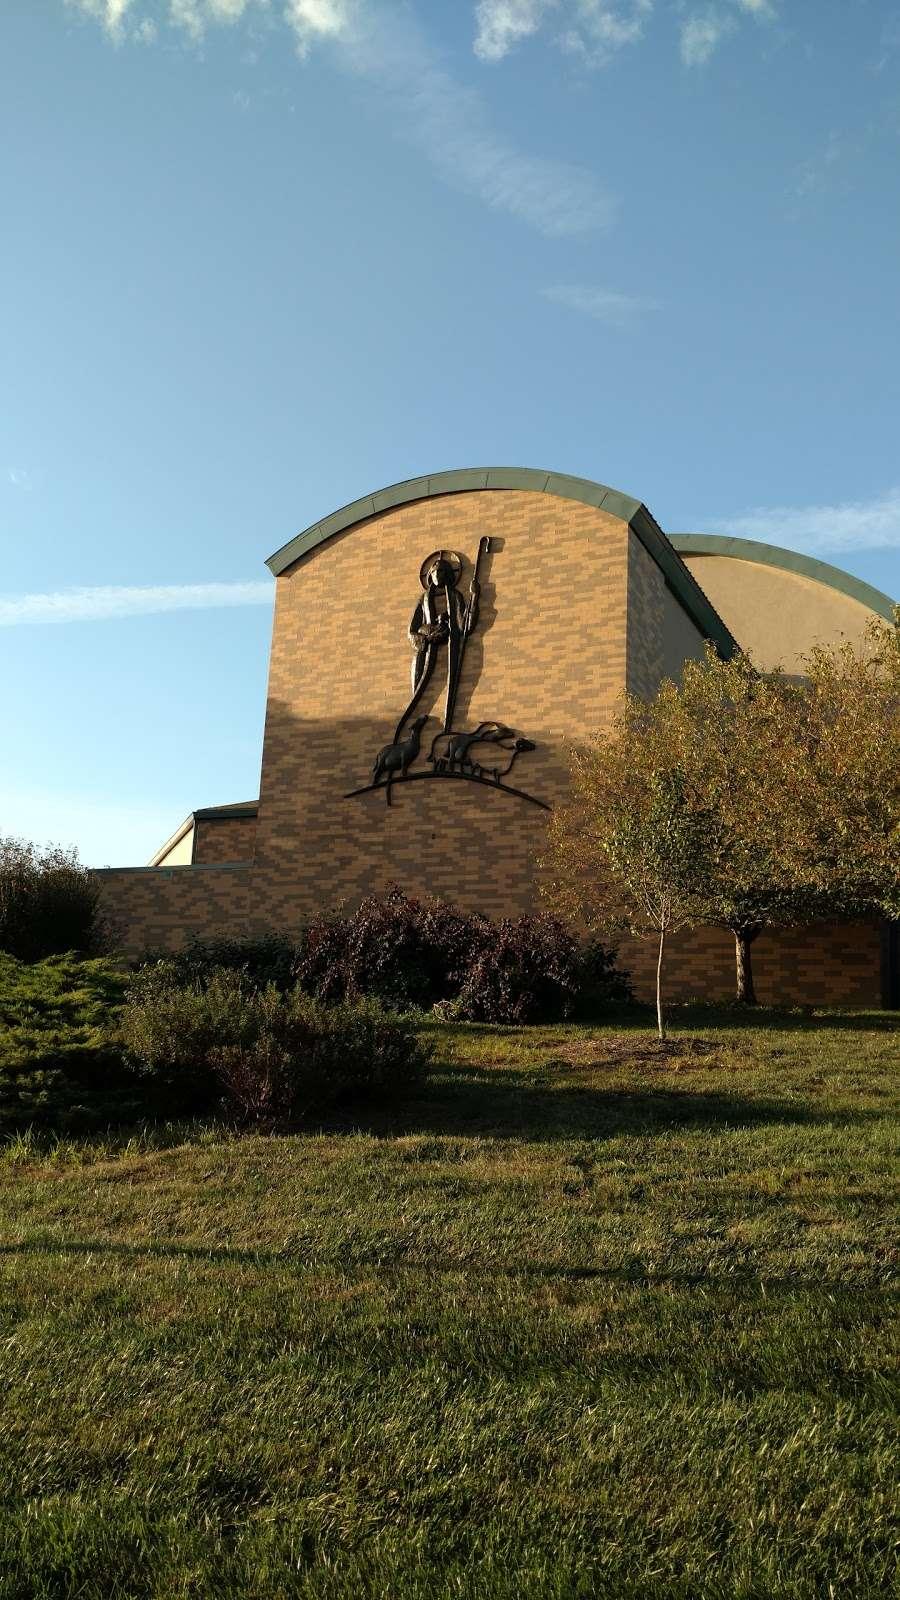 Good Shepherd Catholic Church - church  | Photo 6 of 10 | Address: 12800 W 75th St, Shawnee, KS 66216, USA | Phone: (913) 631-7116